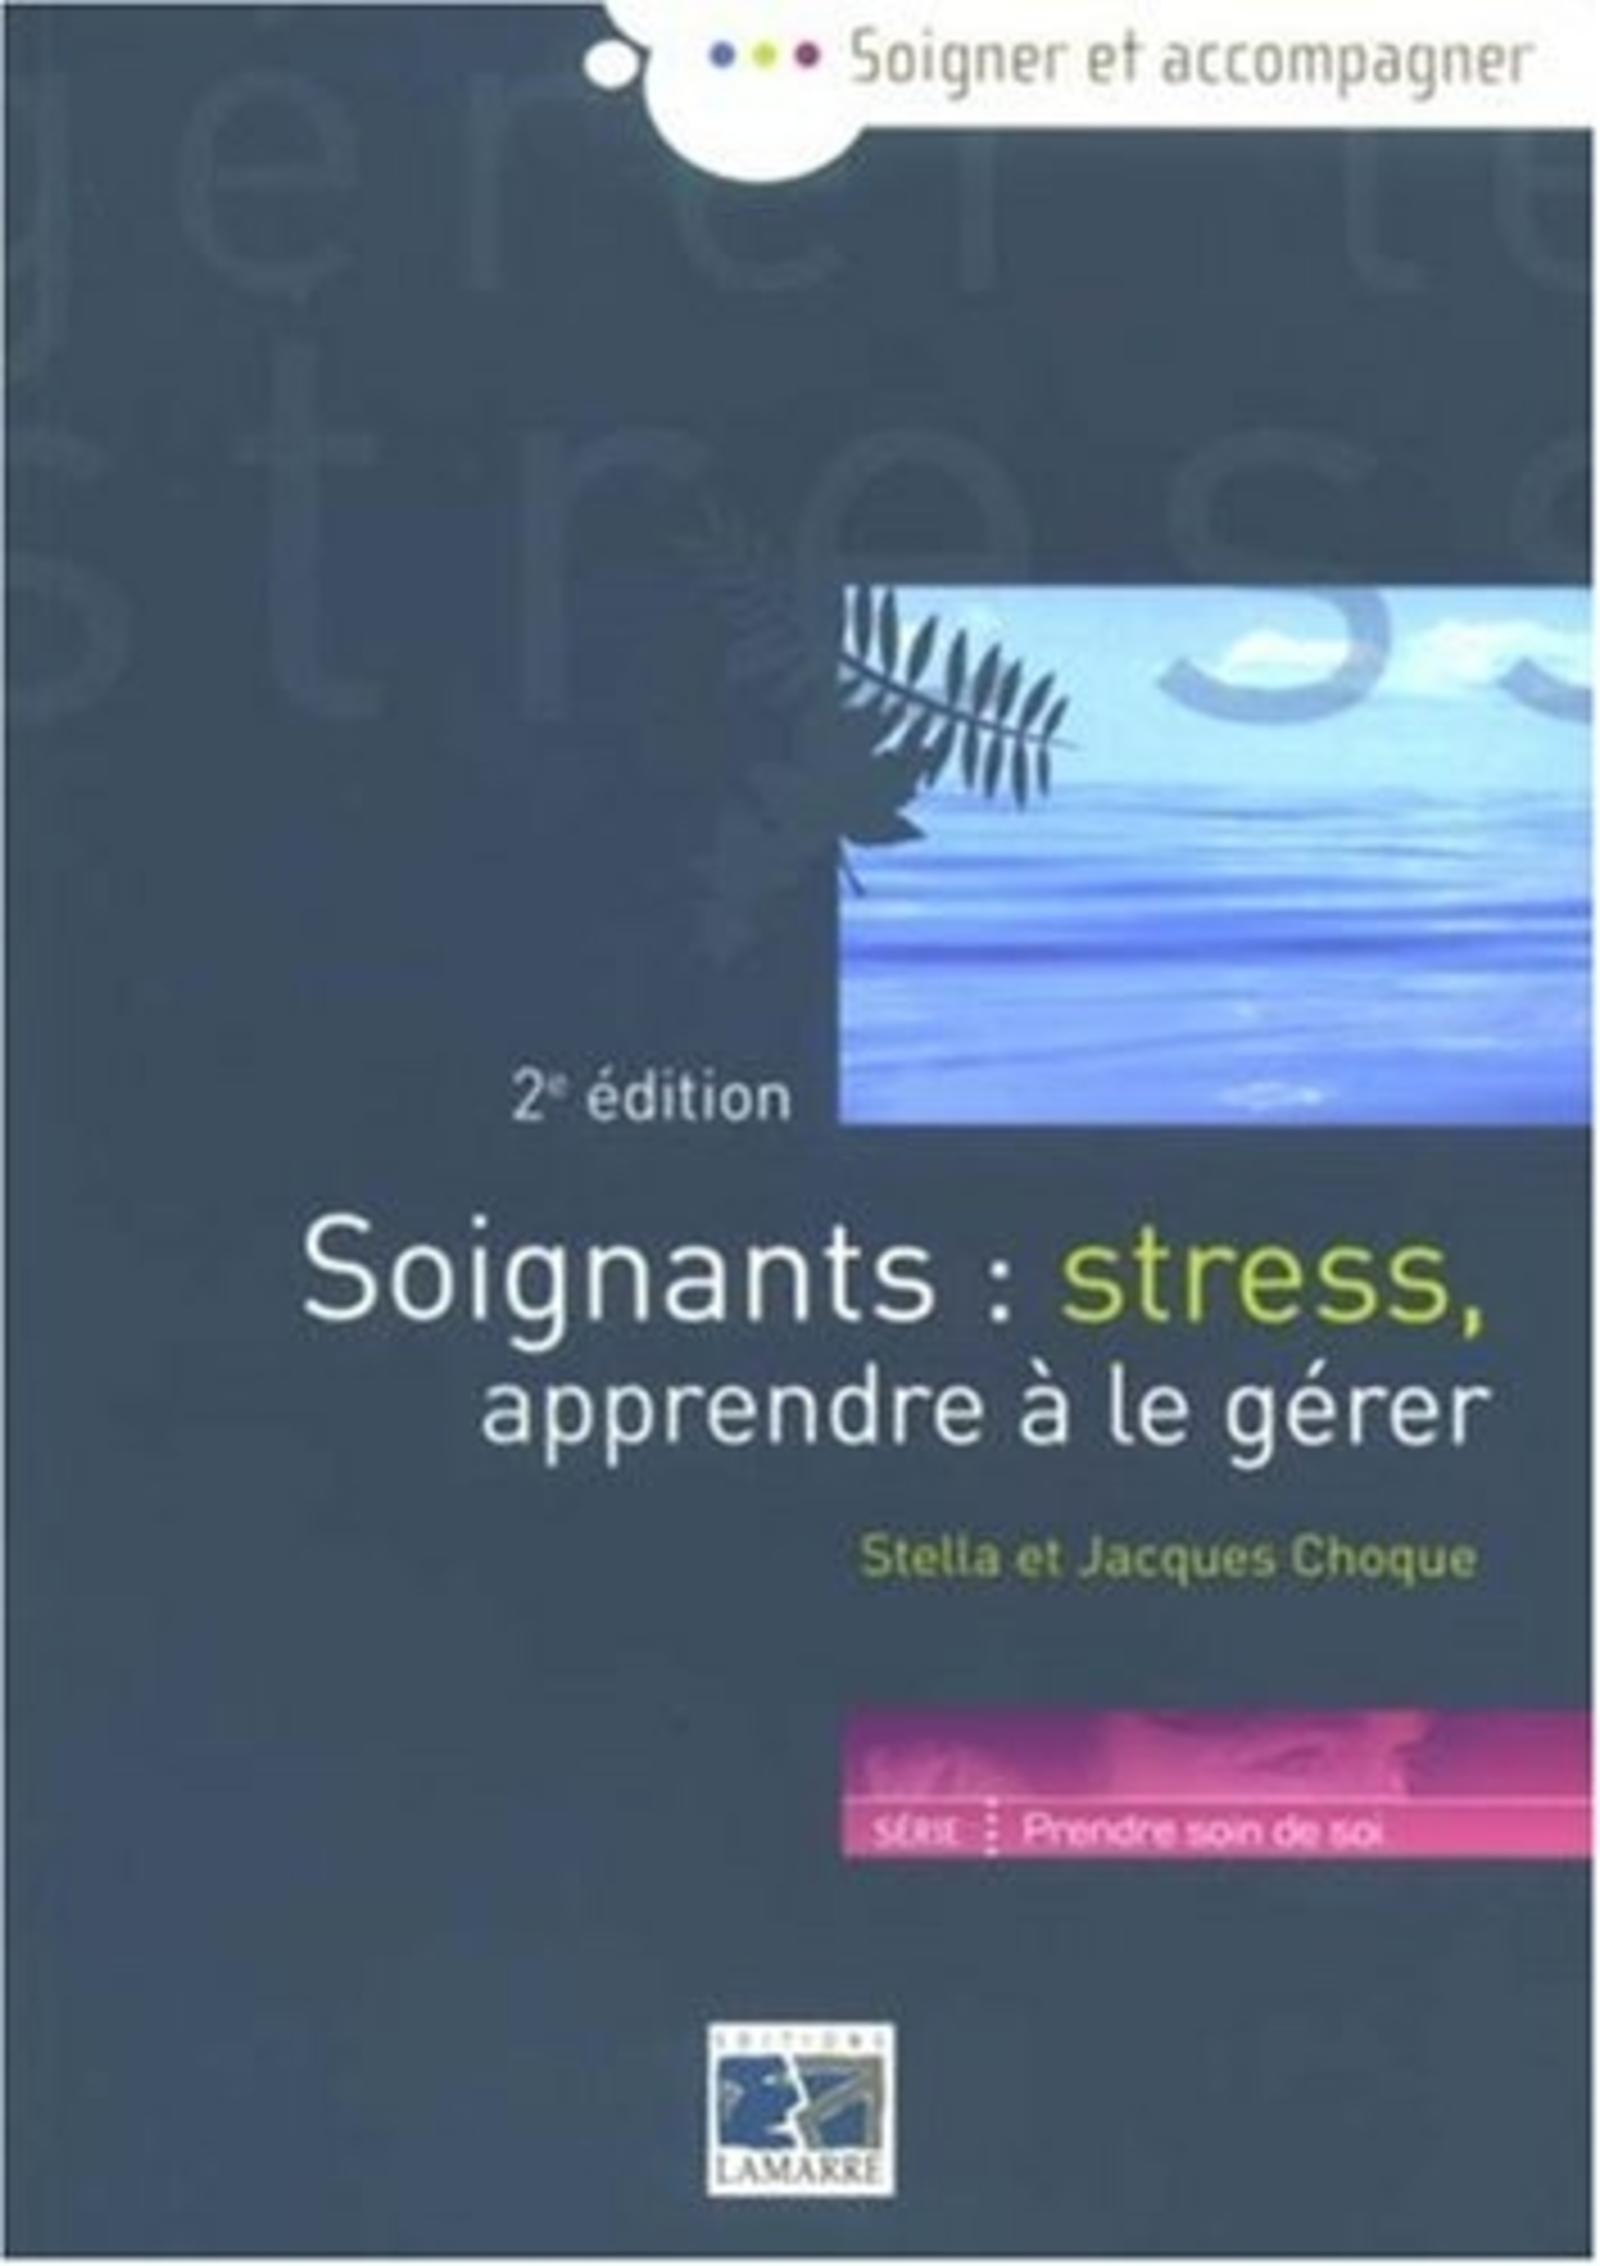 SOIGNANTS STRESS APRRENDRE A LE GERER 2EME EDITION